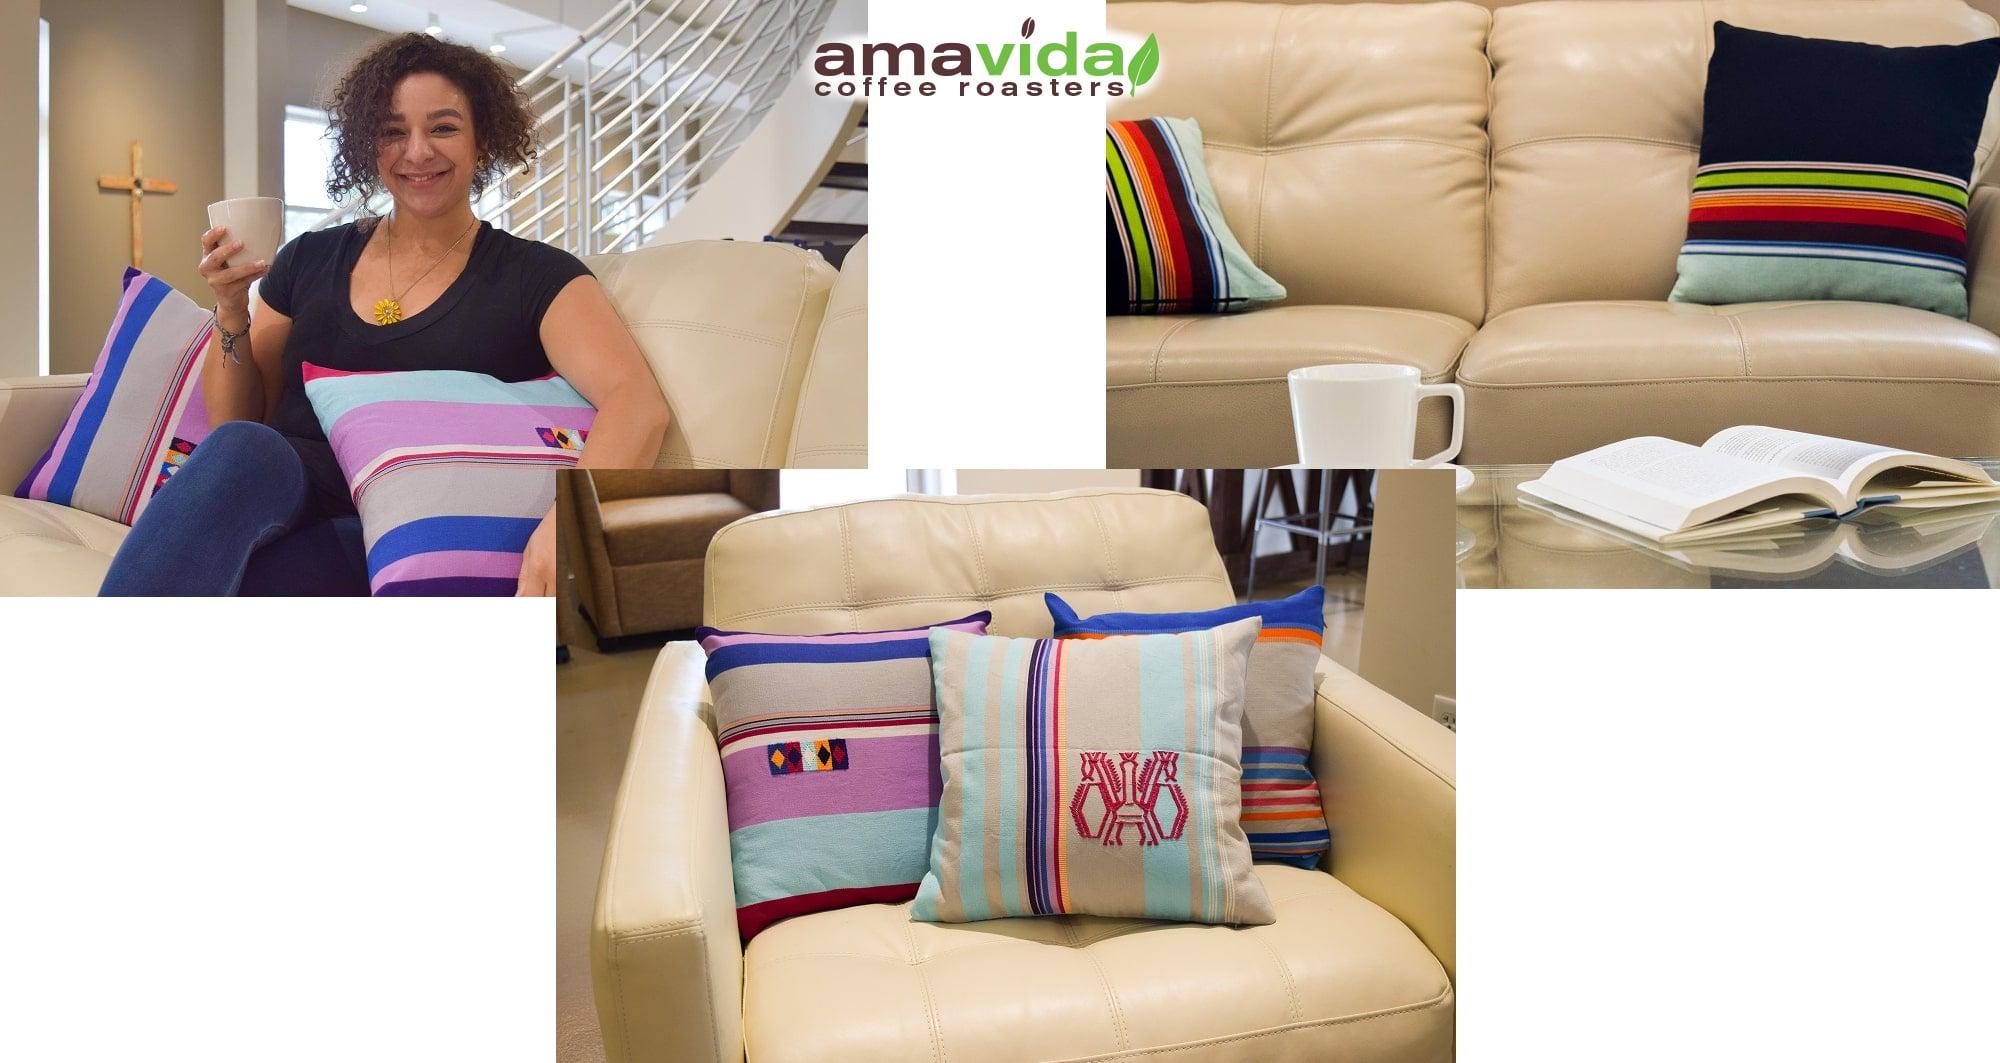 fair-trade-pillow-collage-at-amavida-coffee-in-florida.jpg